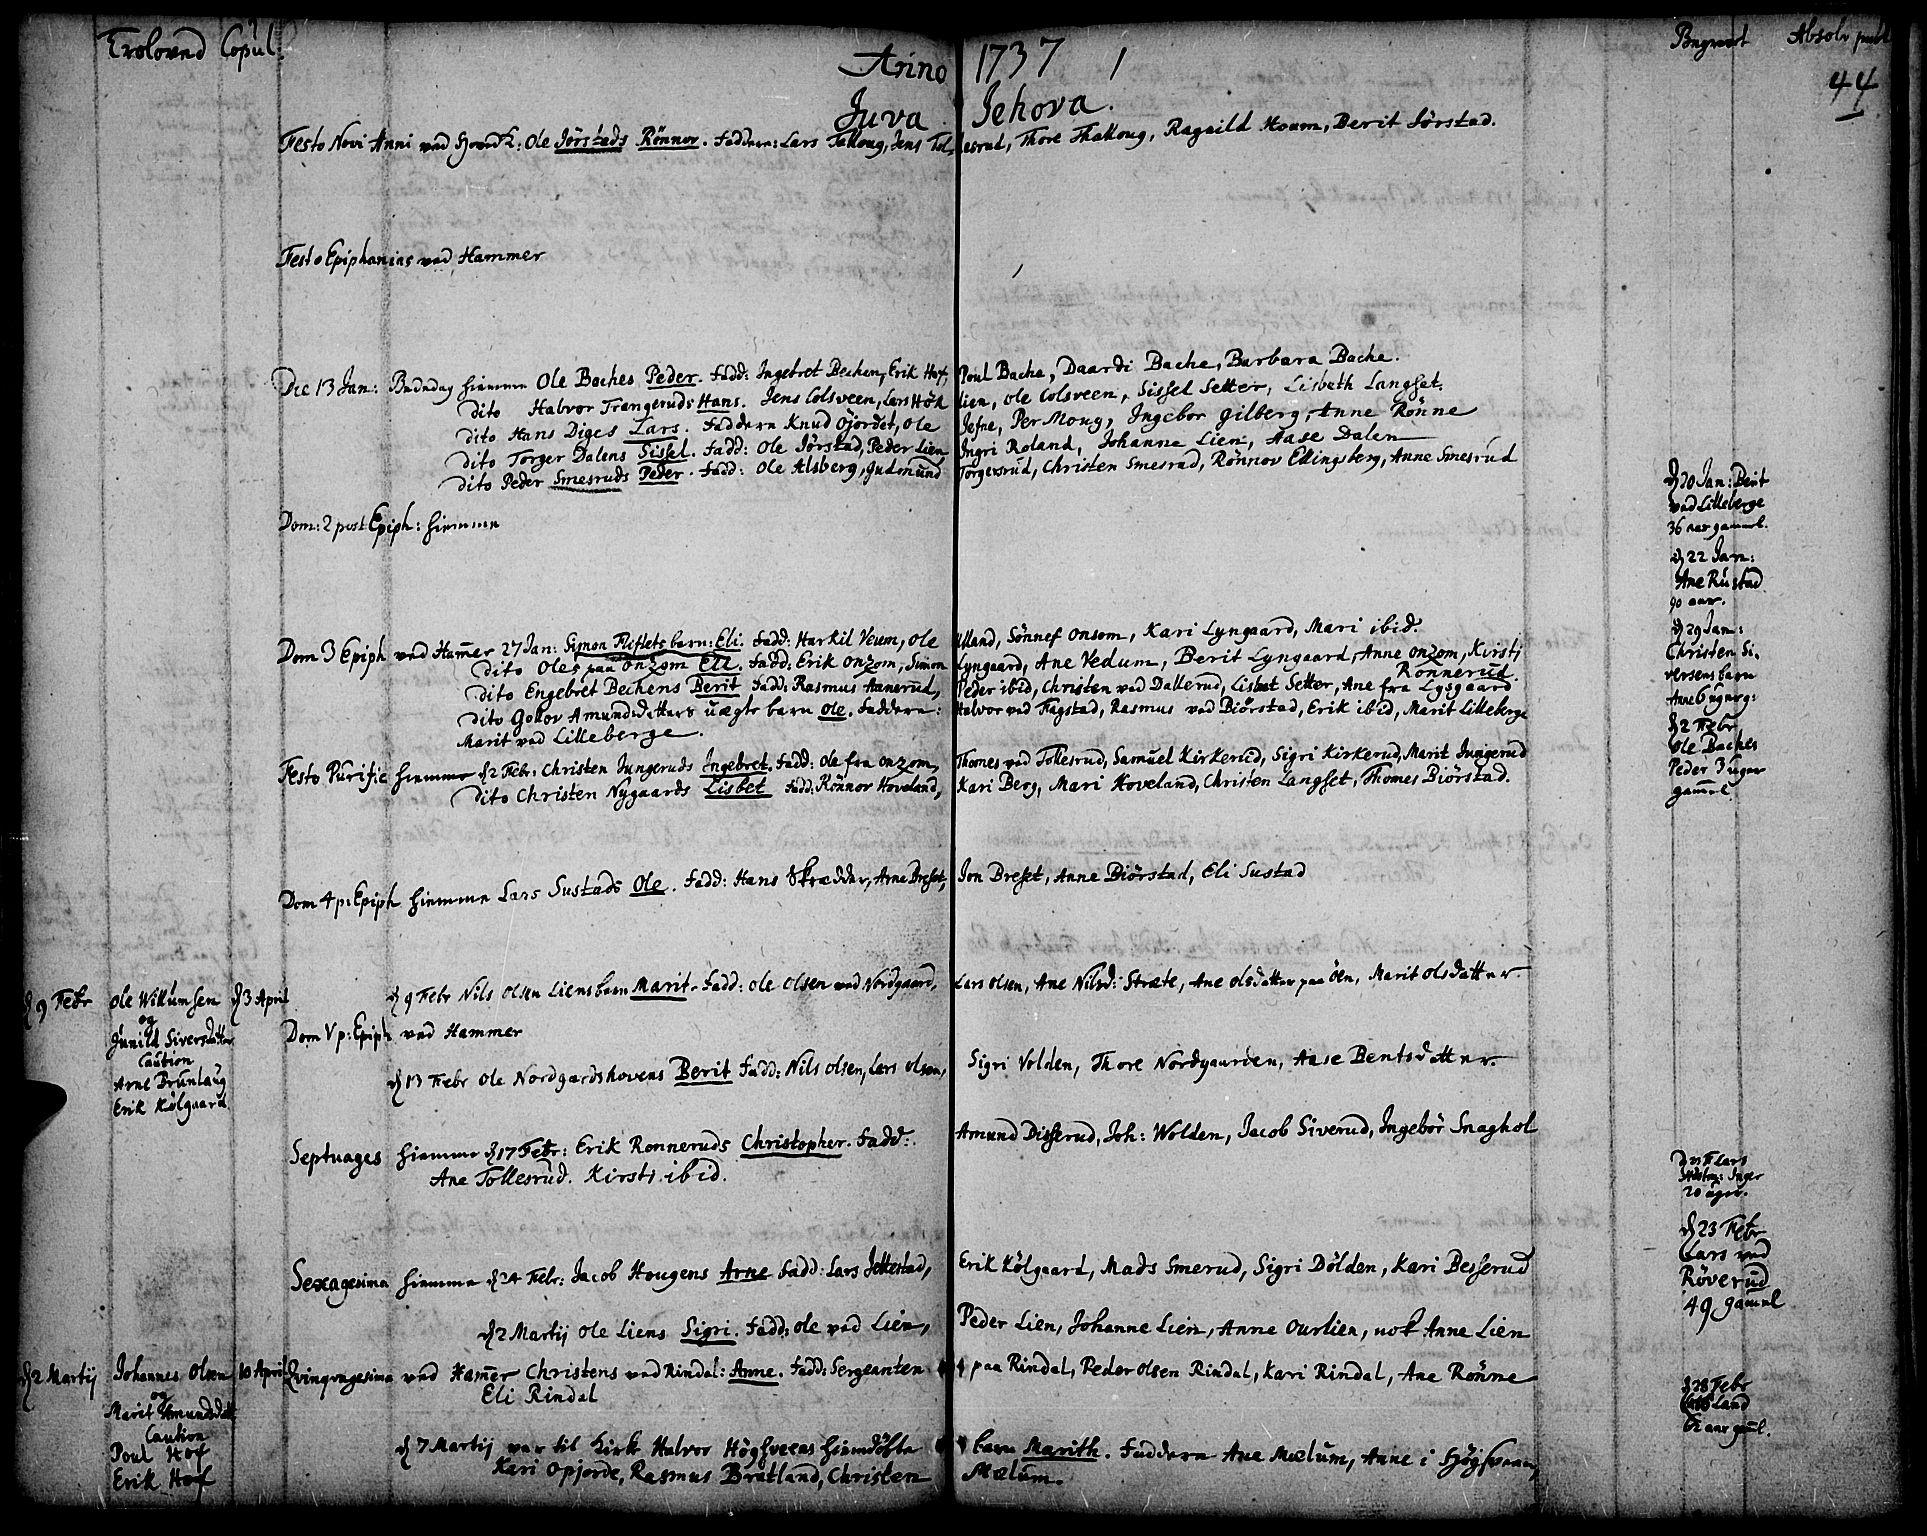 SAH, Fåberg prestekontor, Ministerialbok nr. 1, 1727-1775, s. 44